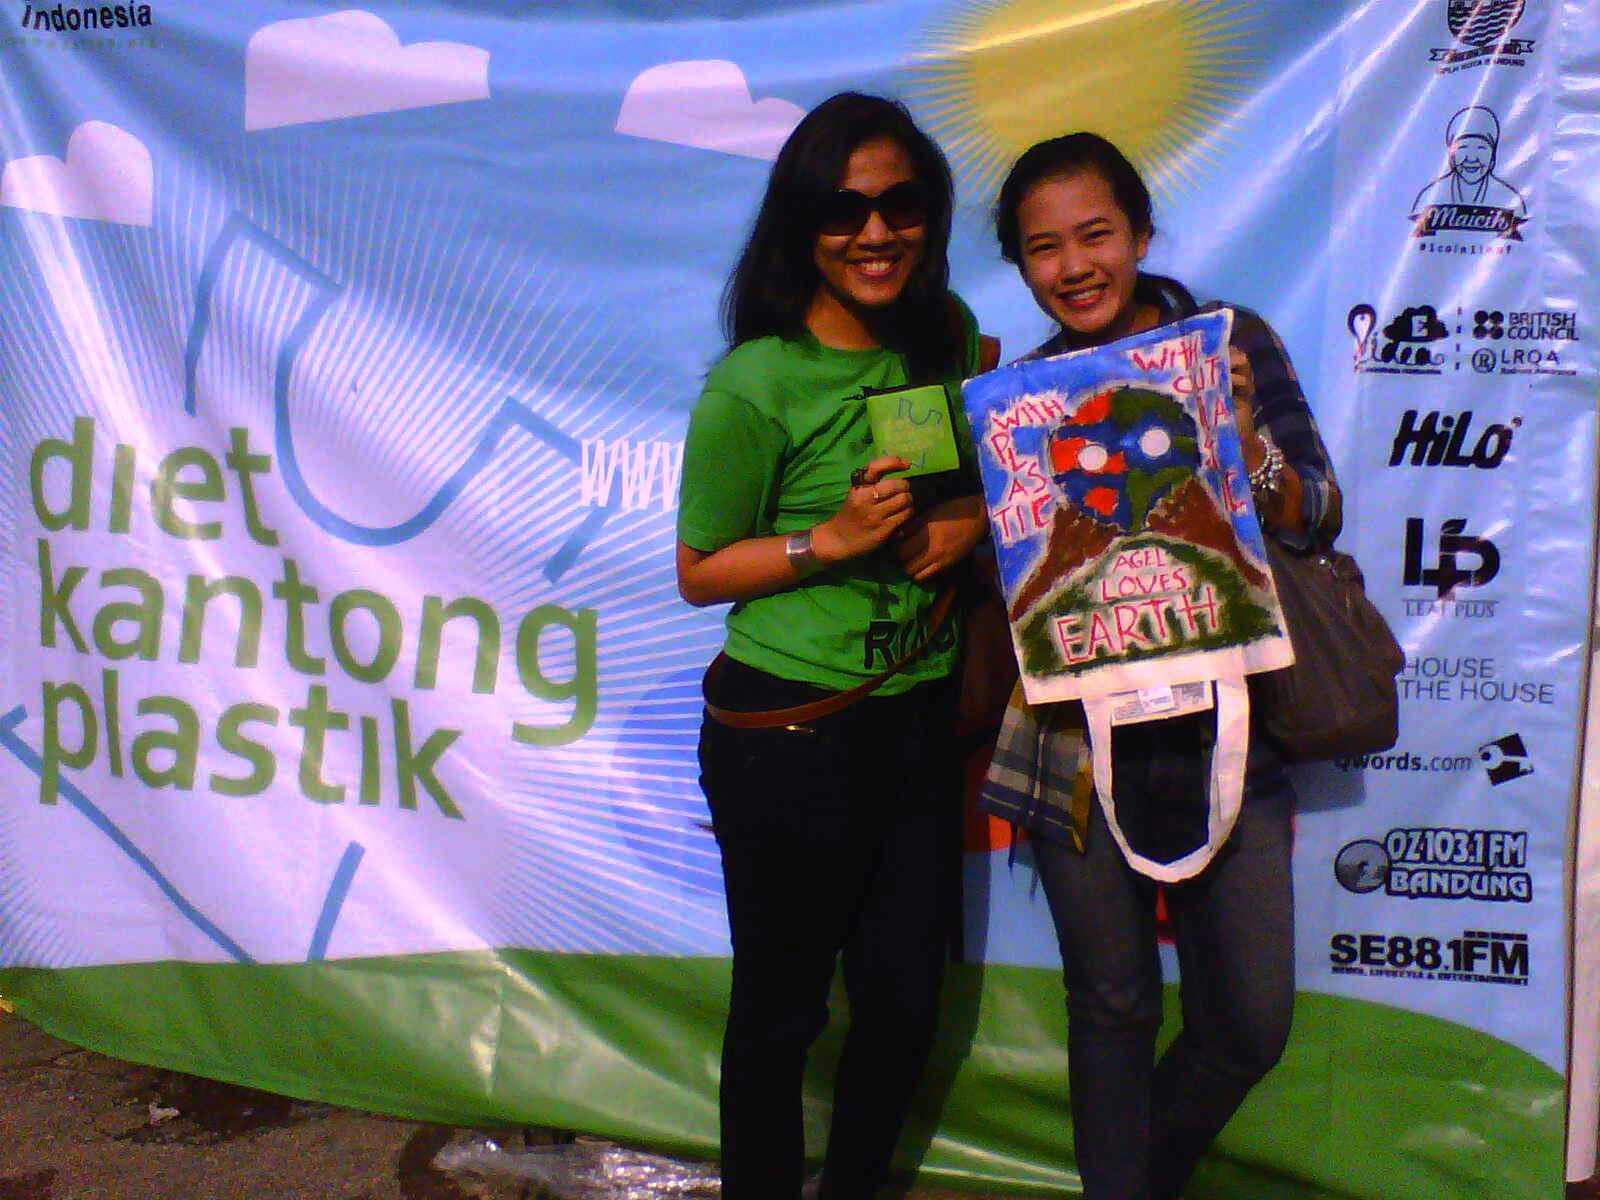 Diet Kantong Plastik, Greeneration Indonesia Buat Tas Bagoes